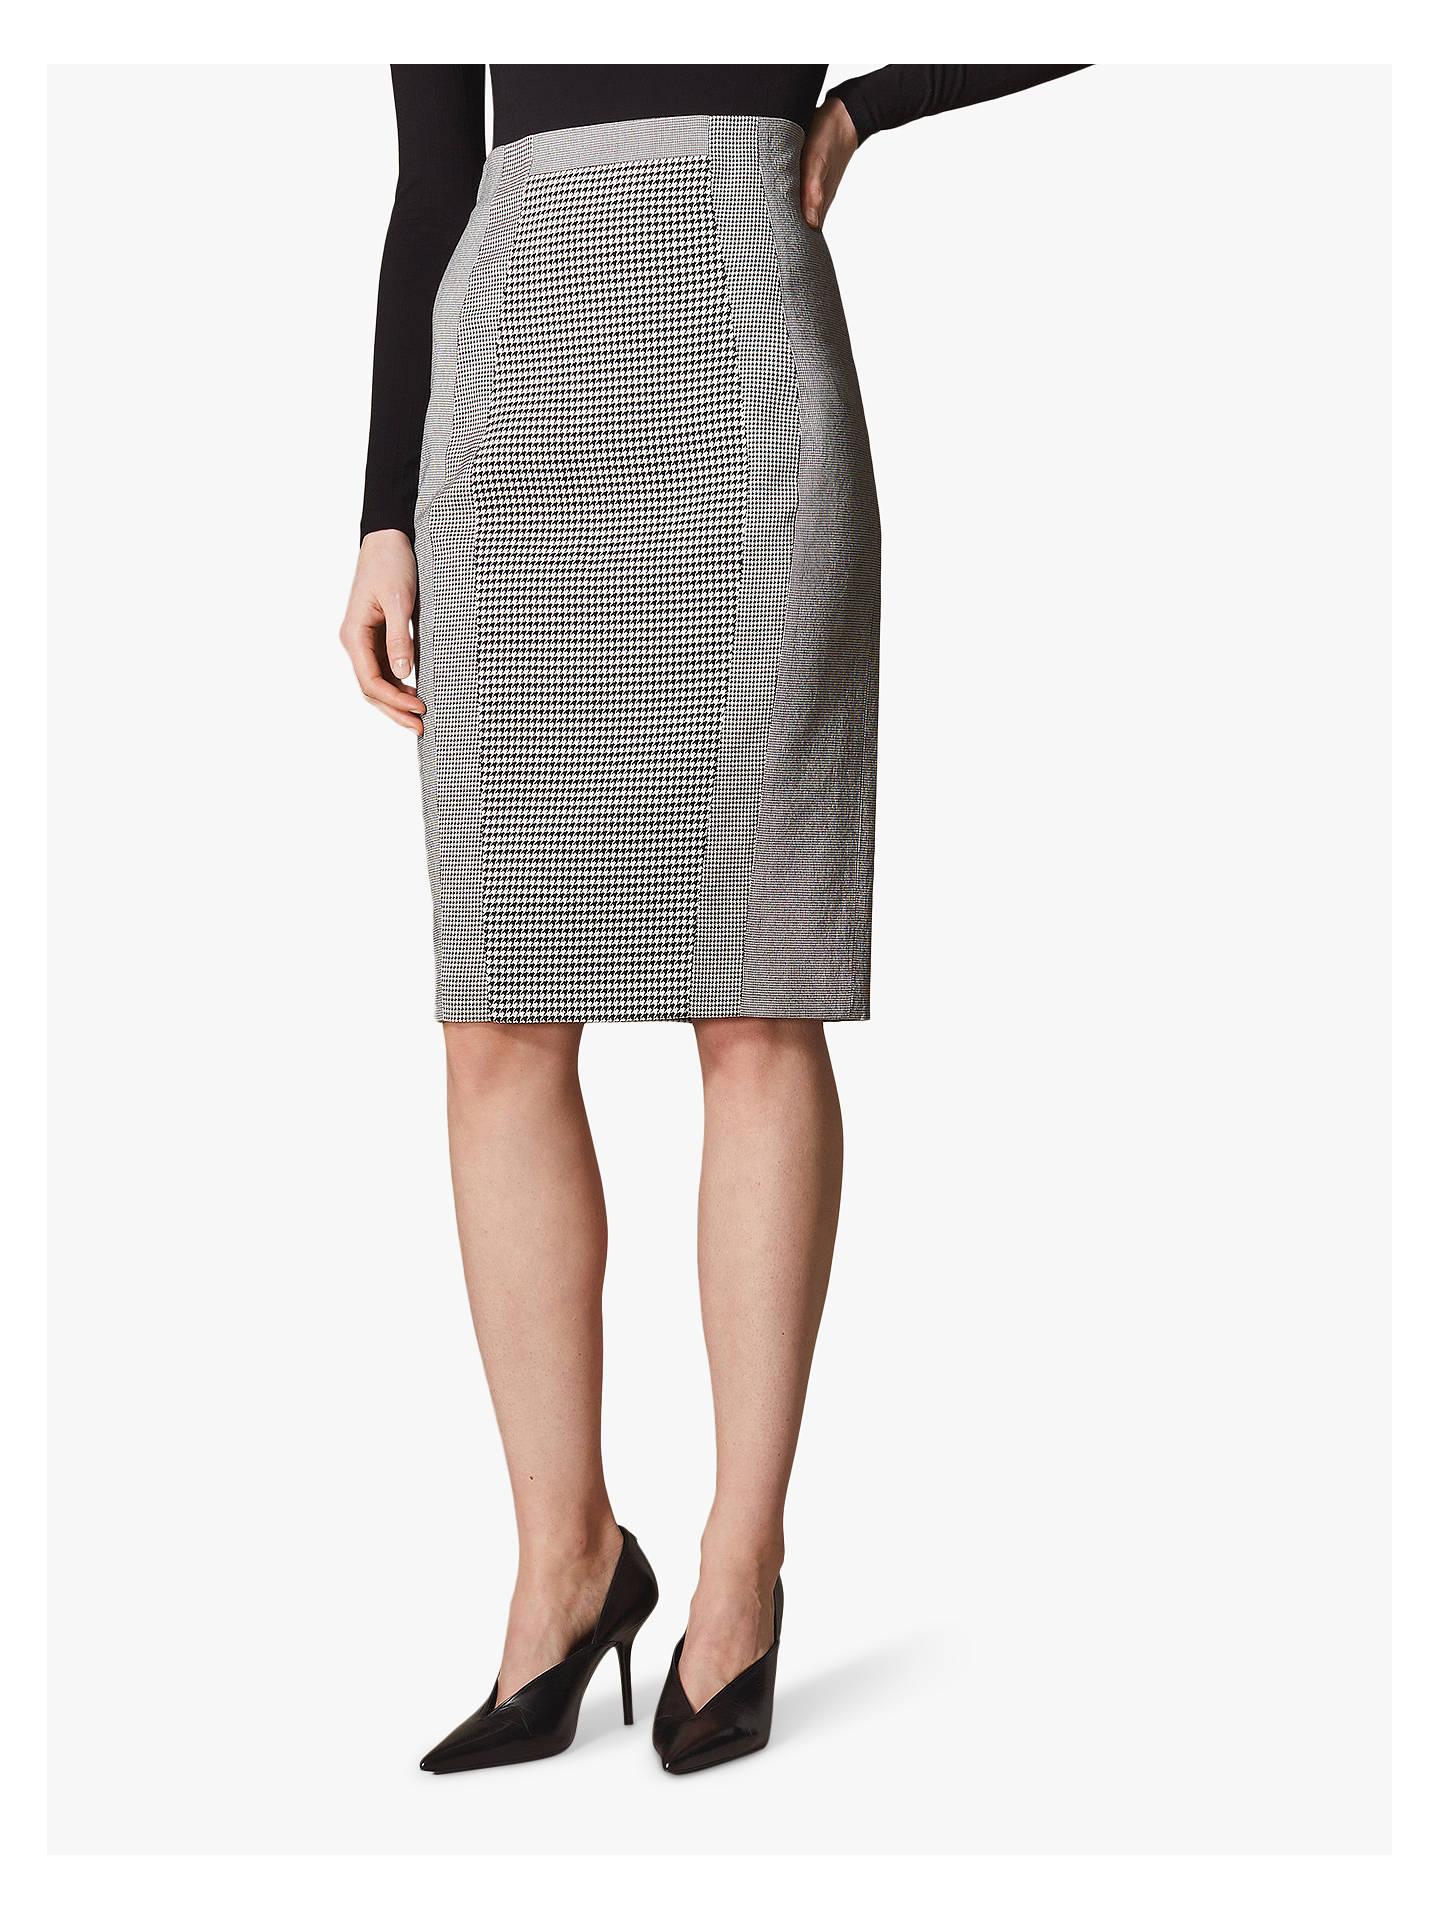 69bec56b5 Buy Karen Millen Gingham Pencil Skirt, Black/White, 6 Online at johnlewis.